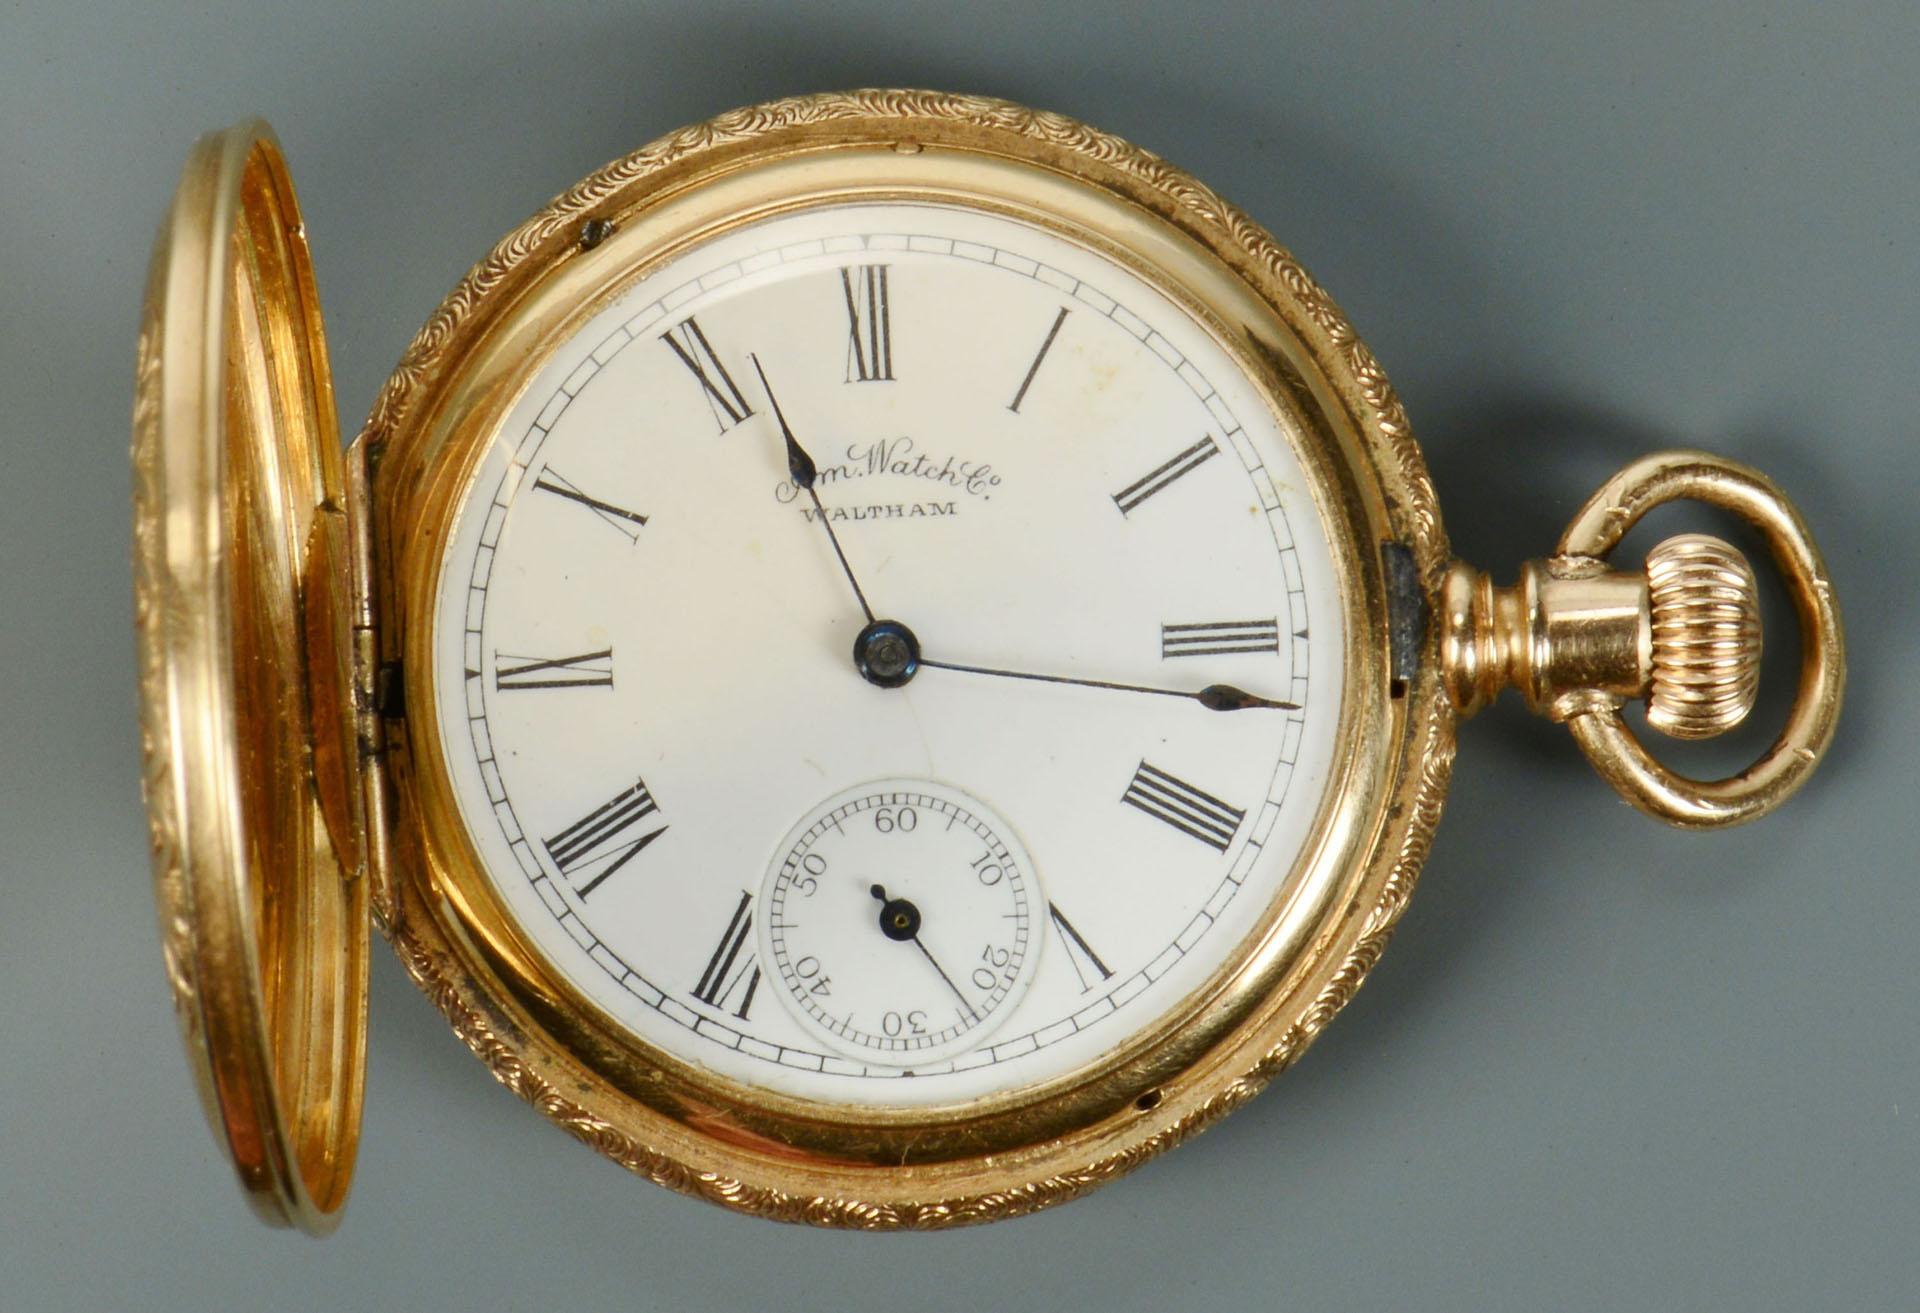 Lot 314 14k Ladies Waltham Pocket Watch